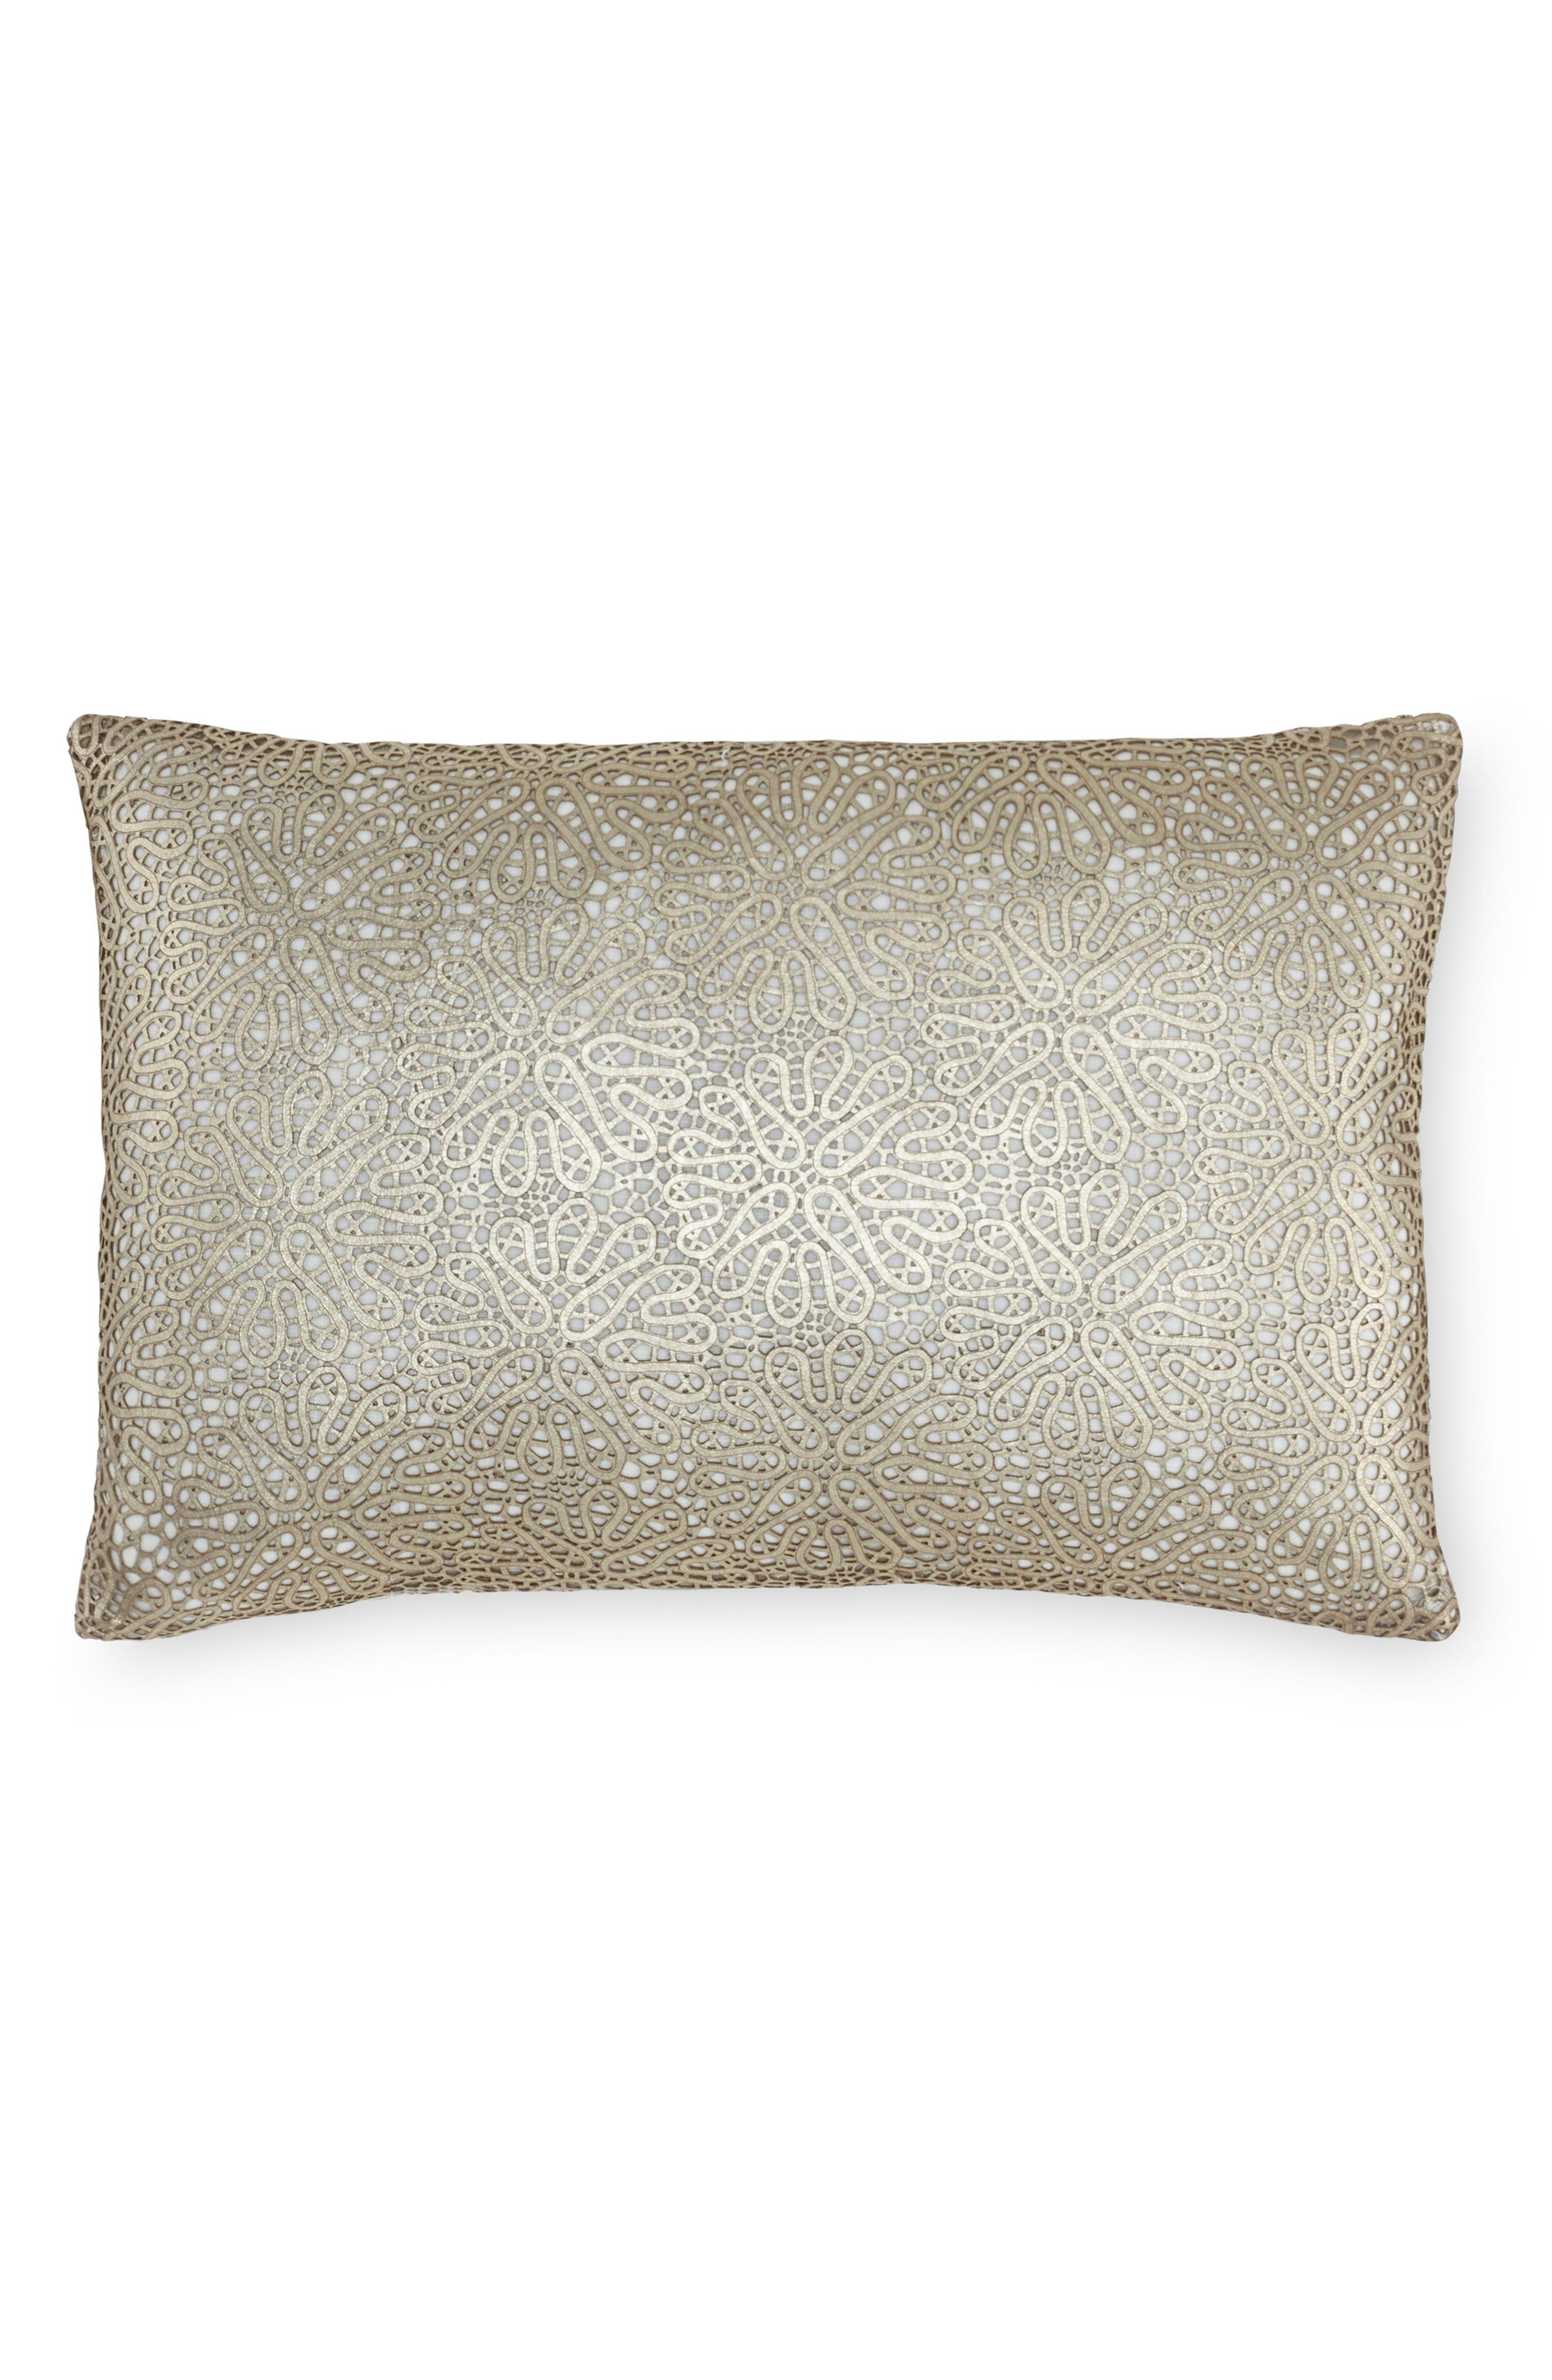 SFERRA Liana Leather Accent Pillow